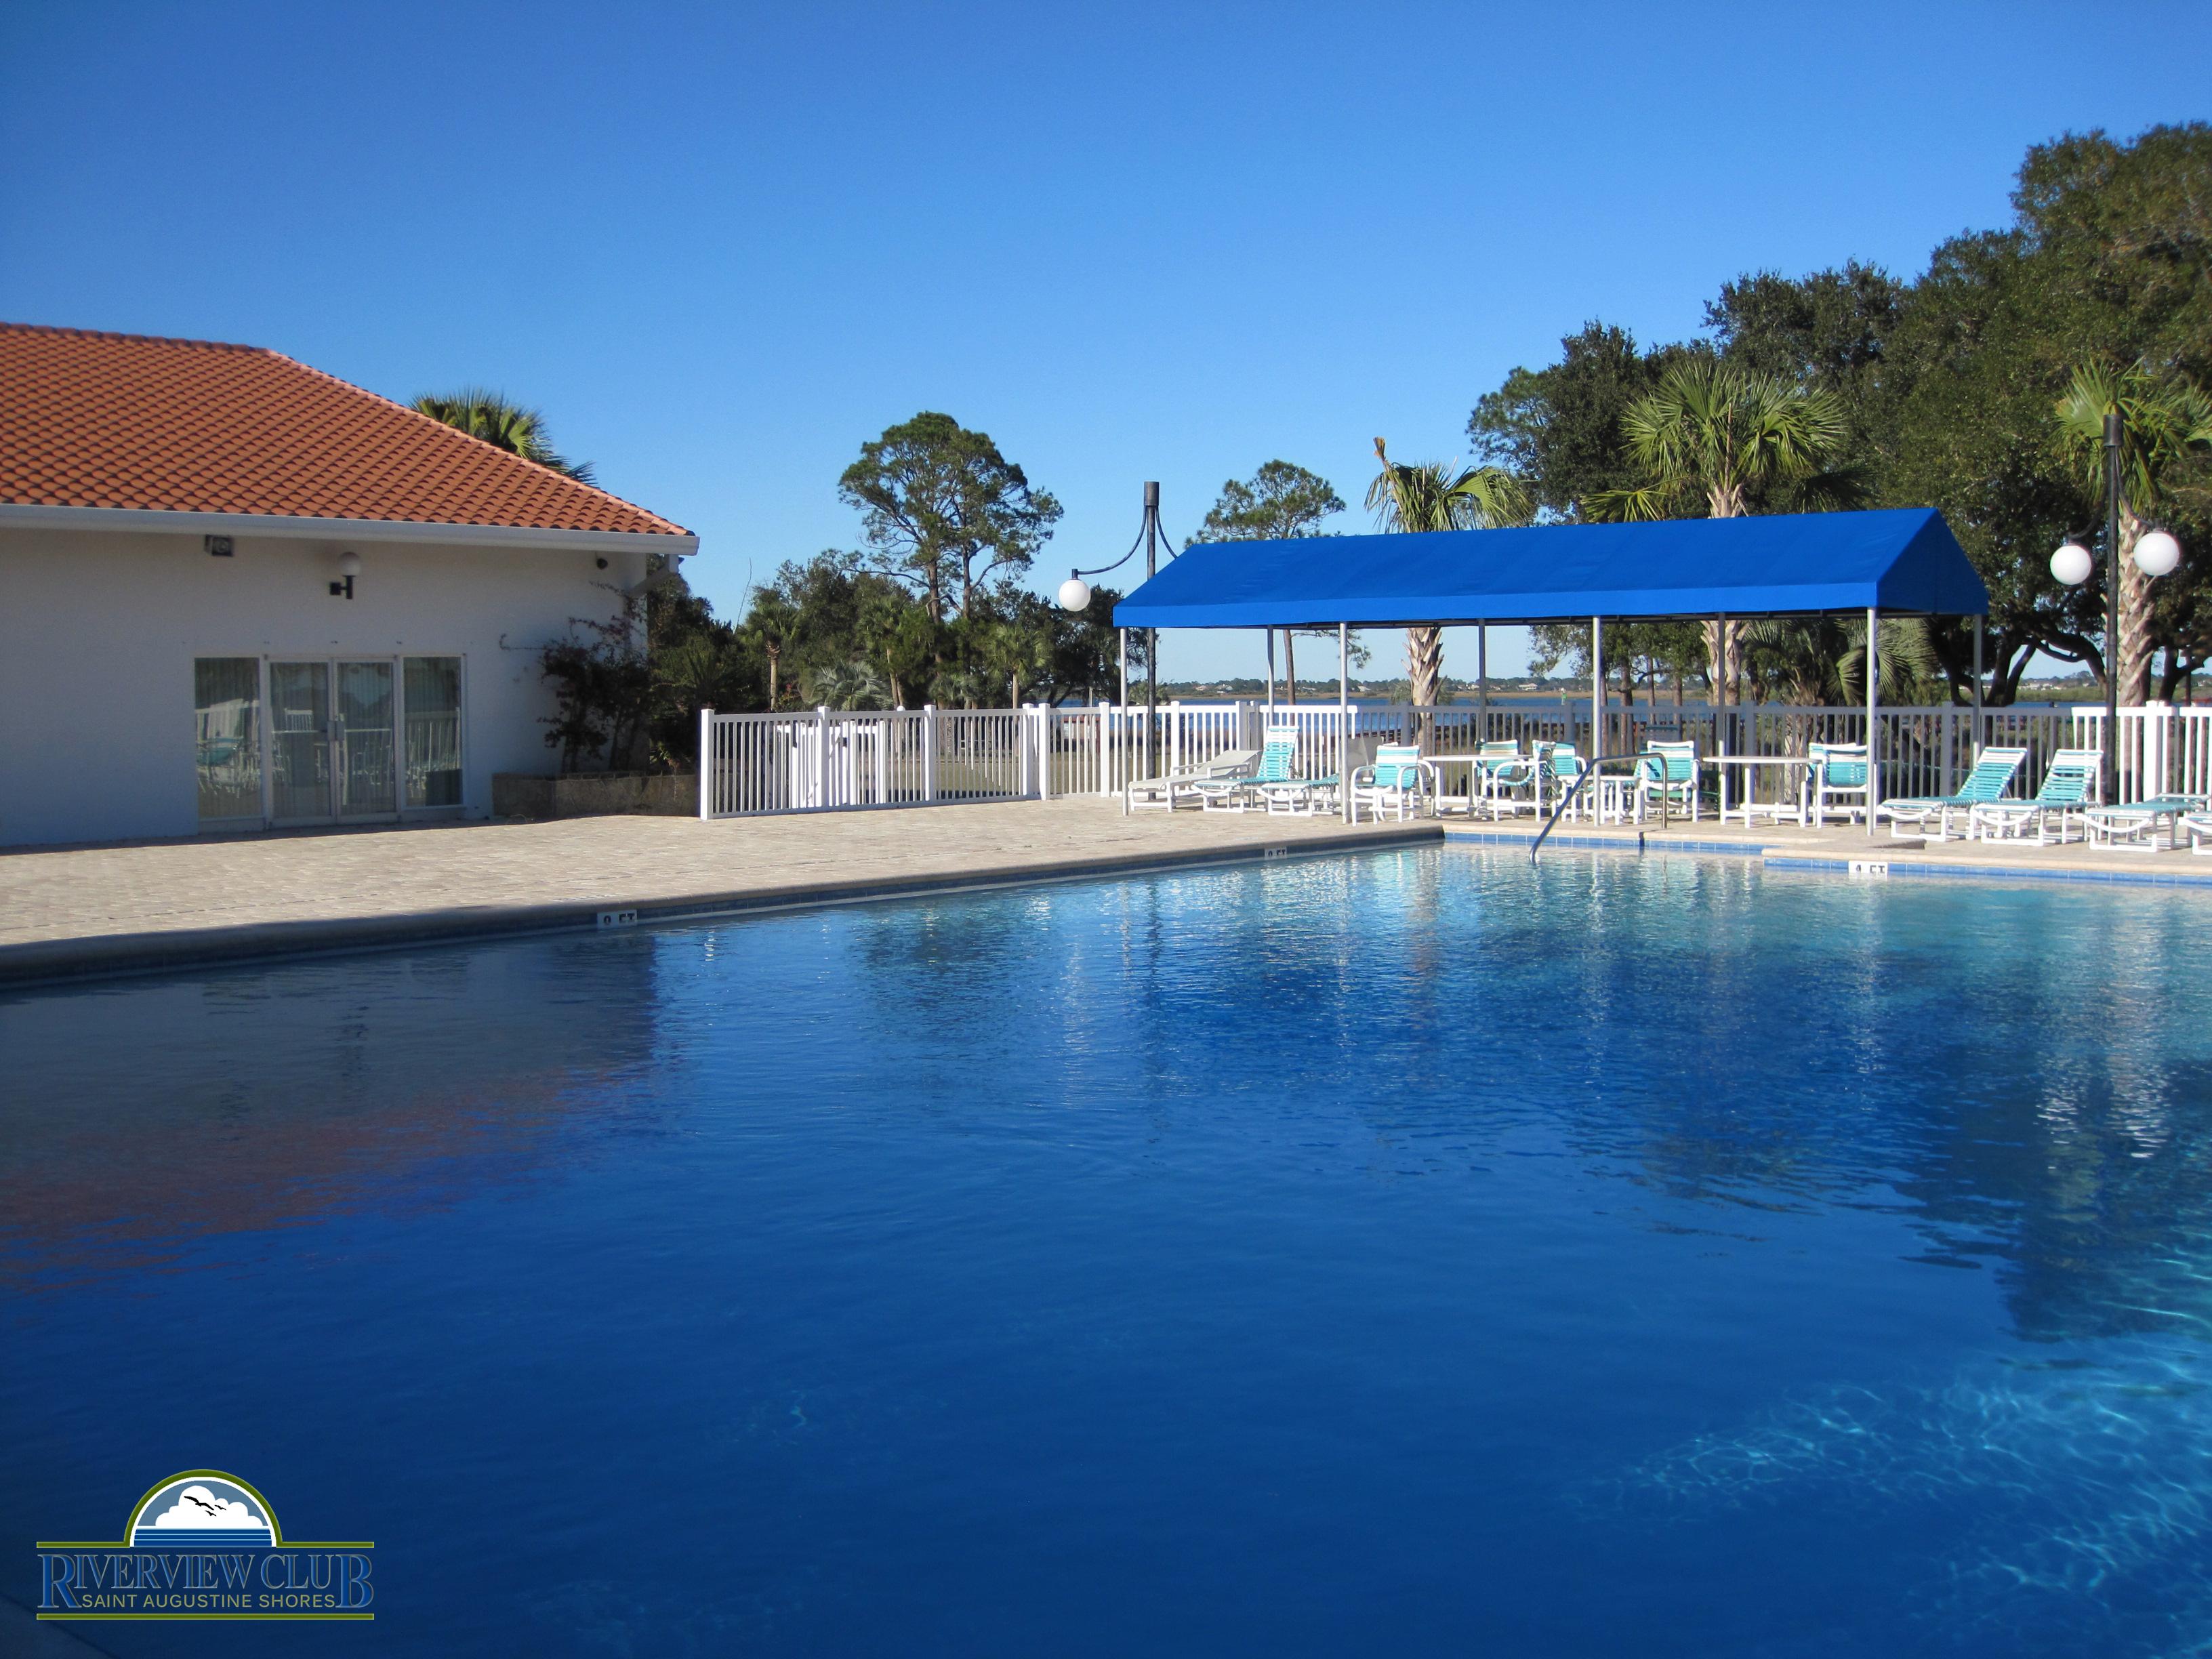 Riverview Club Pool